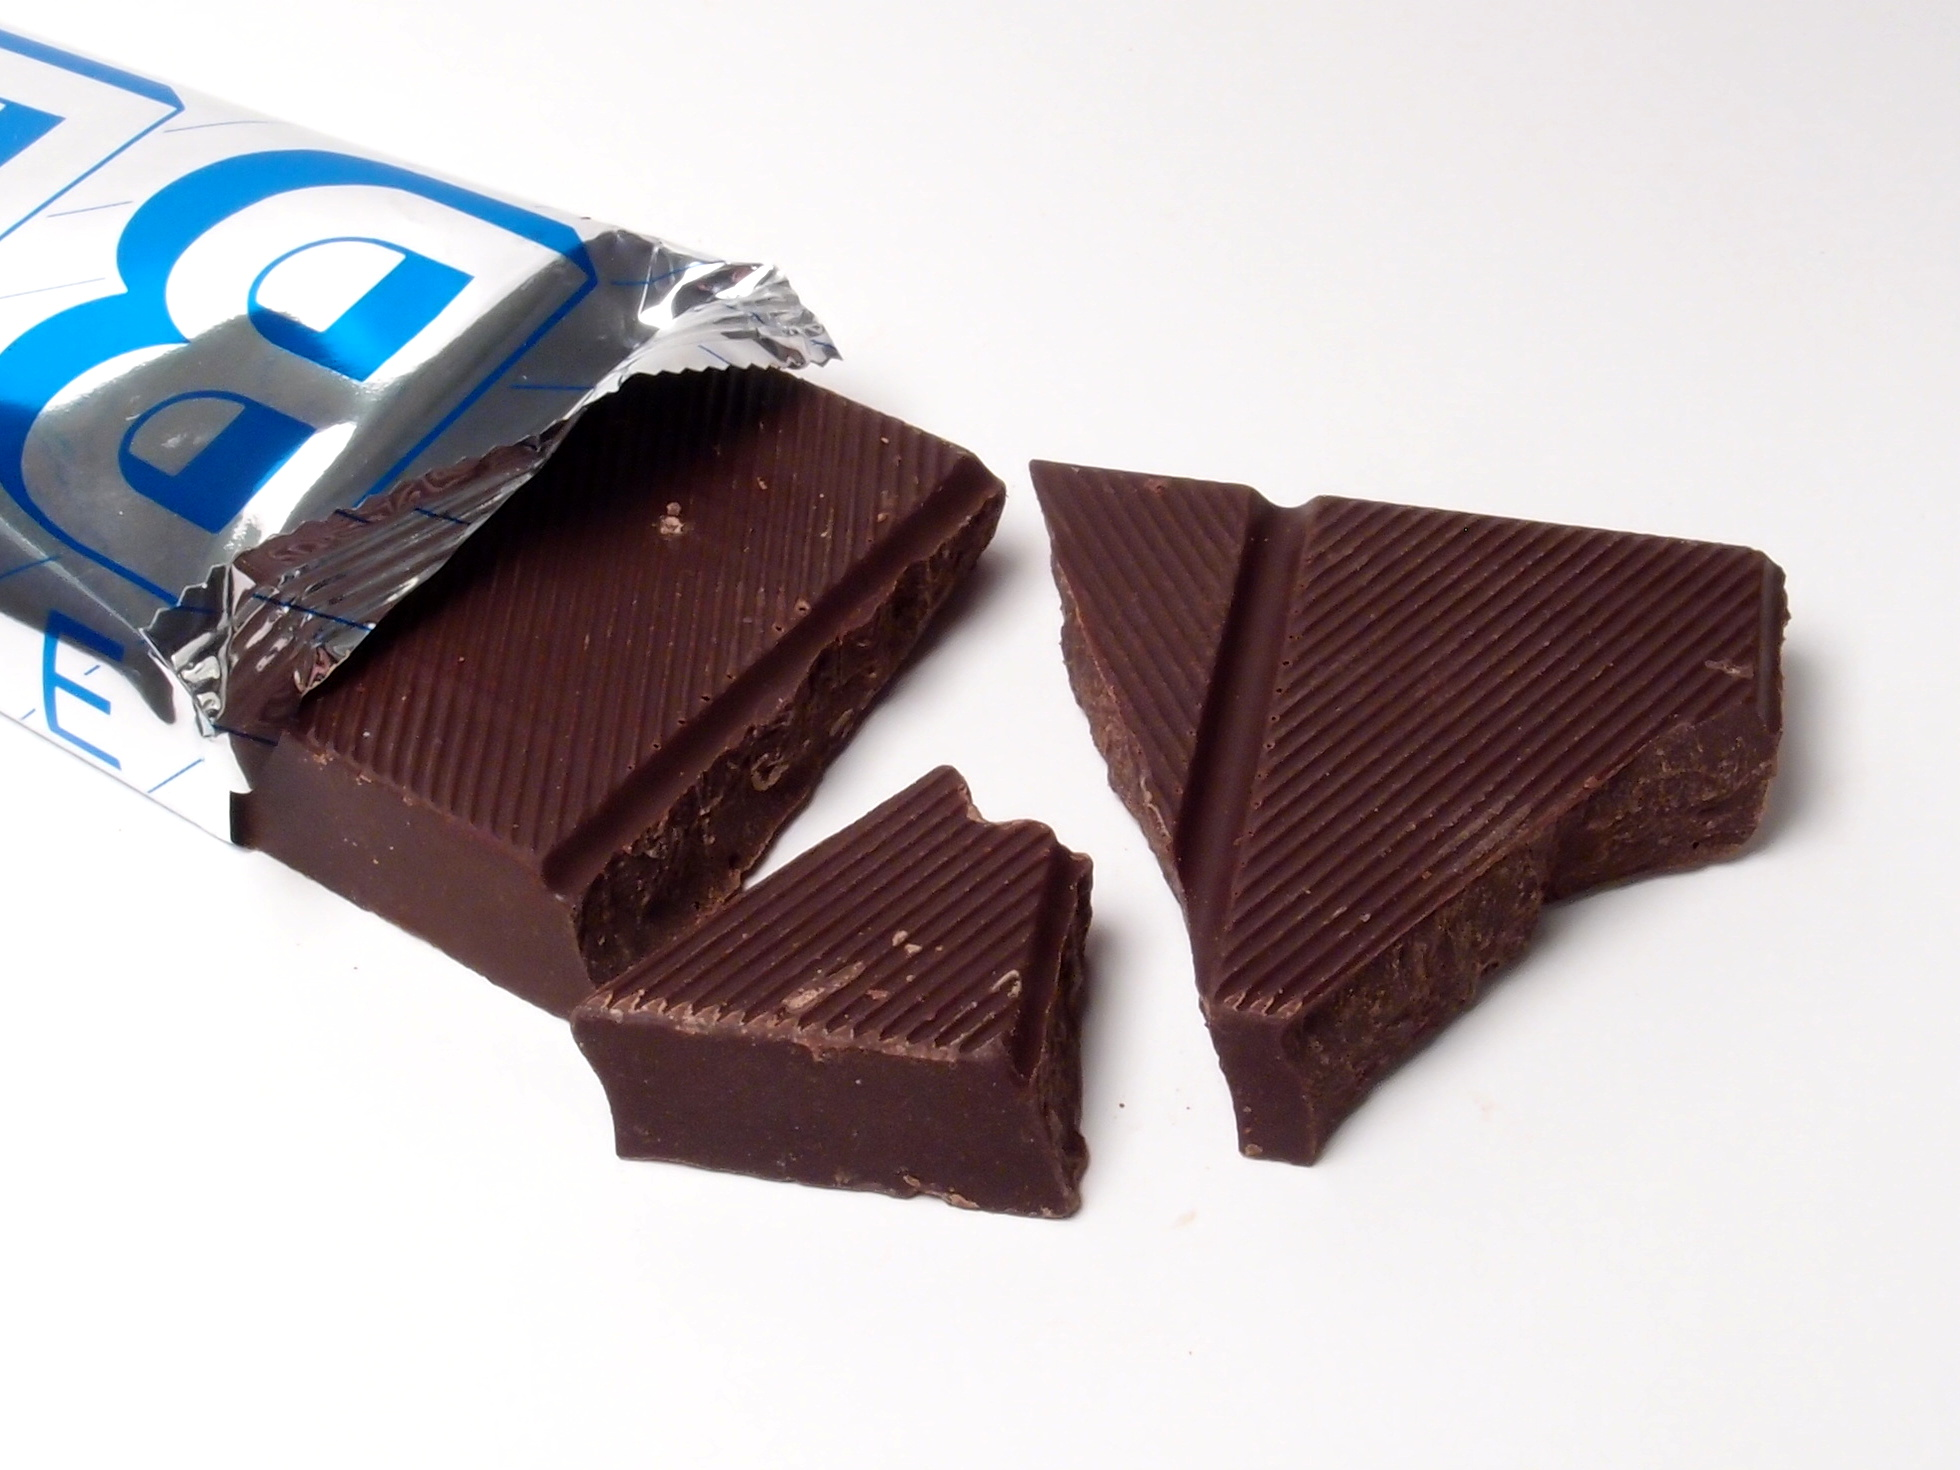 Blockschokolade Wikipedia